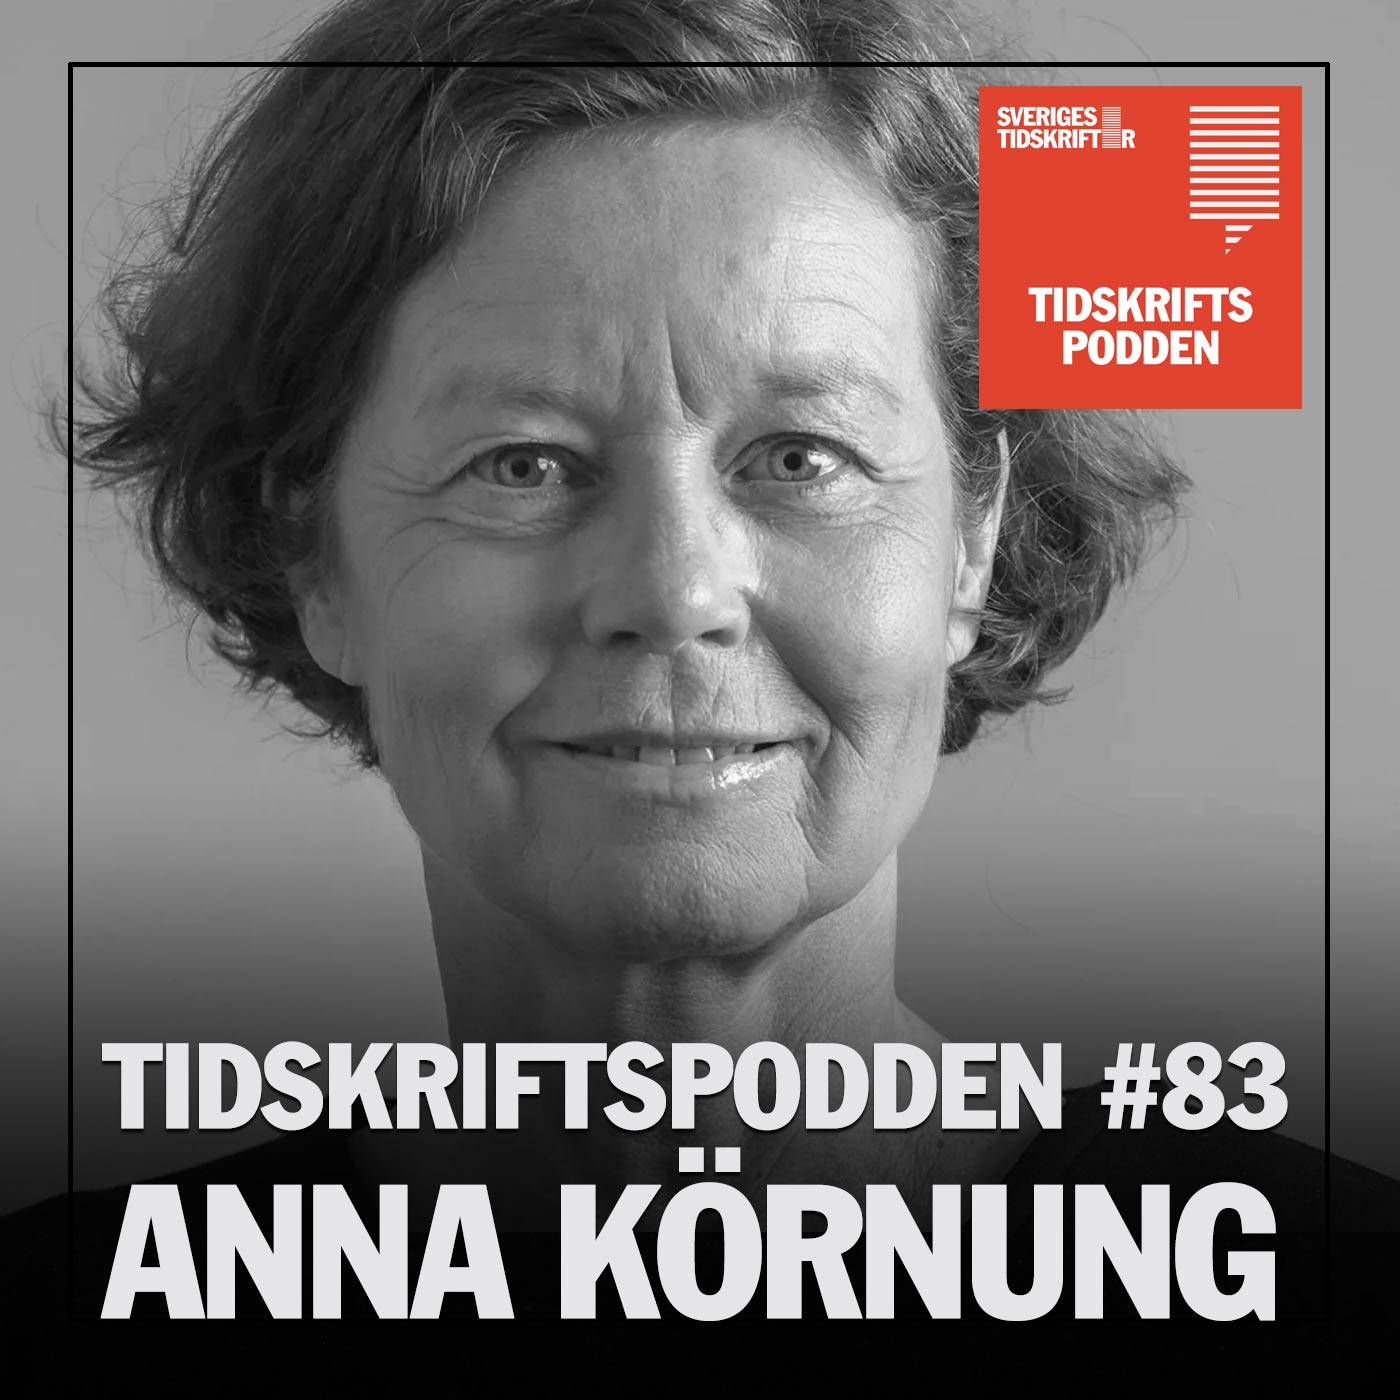 Anna Körnung, Tidskriftspodden